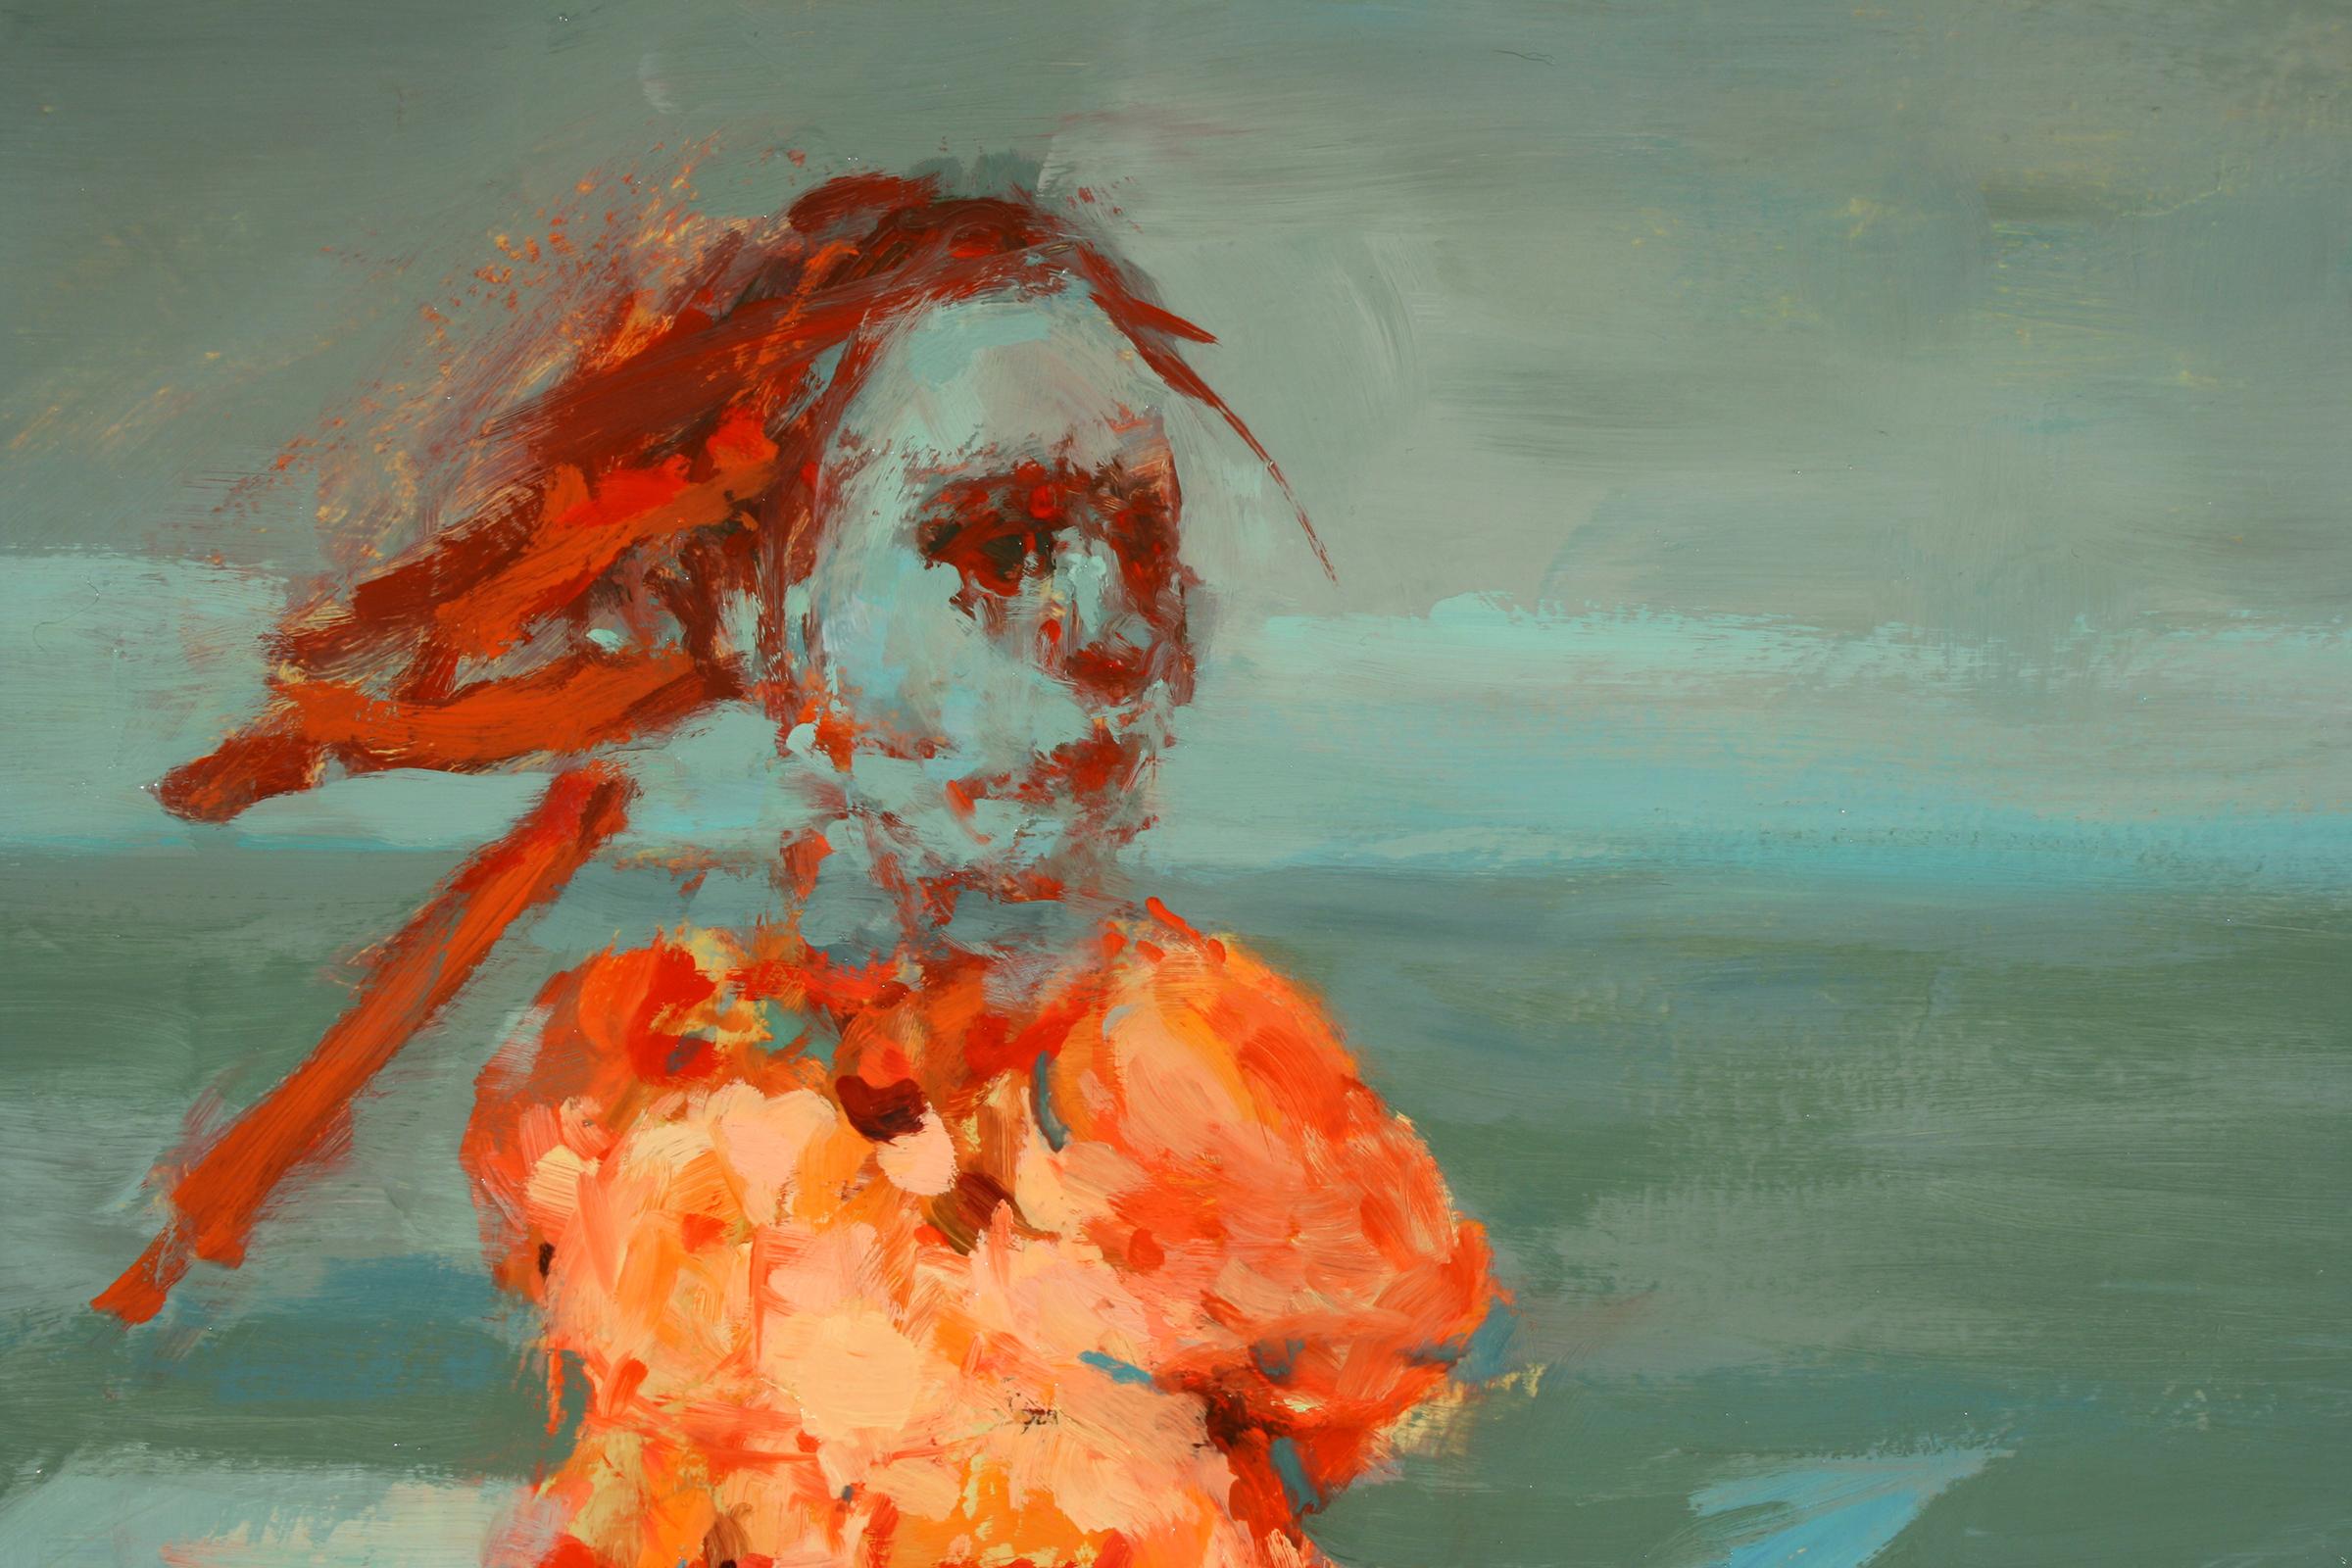 "Phantom (detail), oil on canvas, 42"" x 42"" x 2"", 2011"